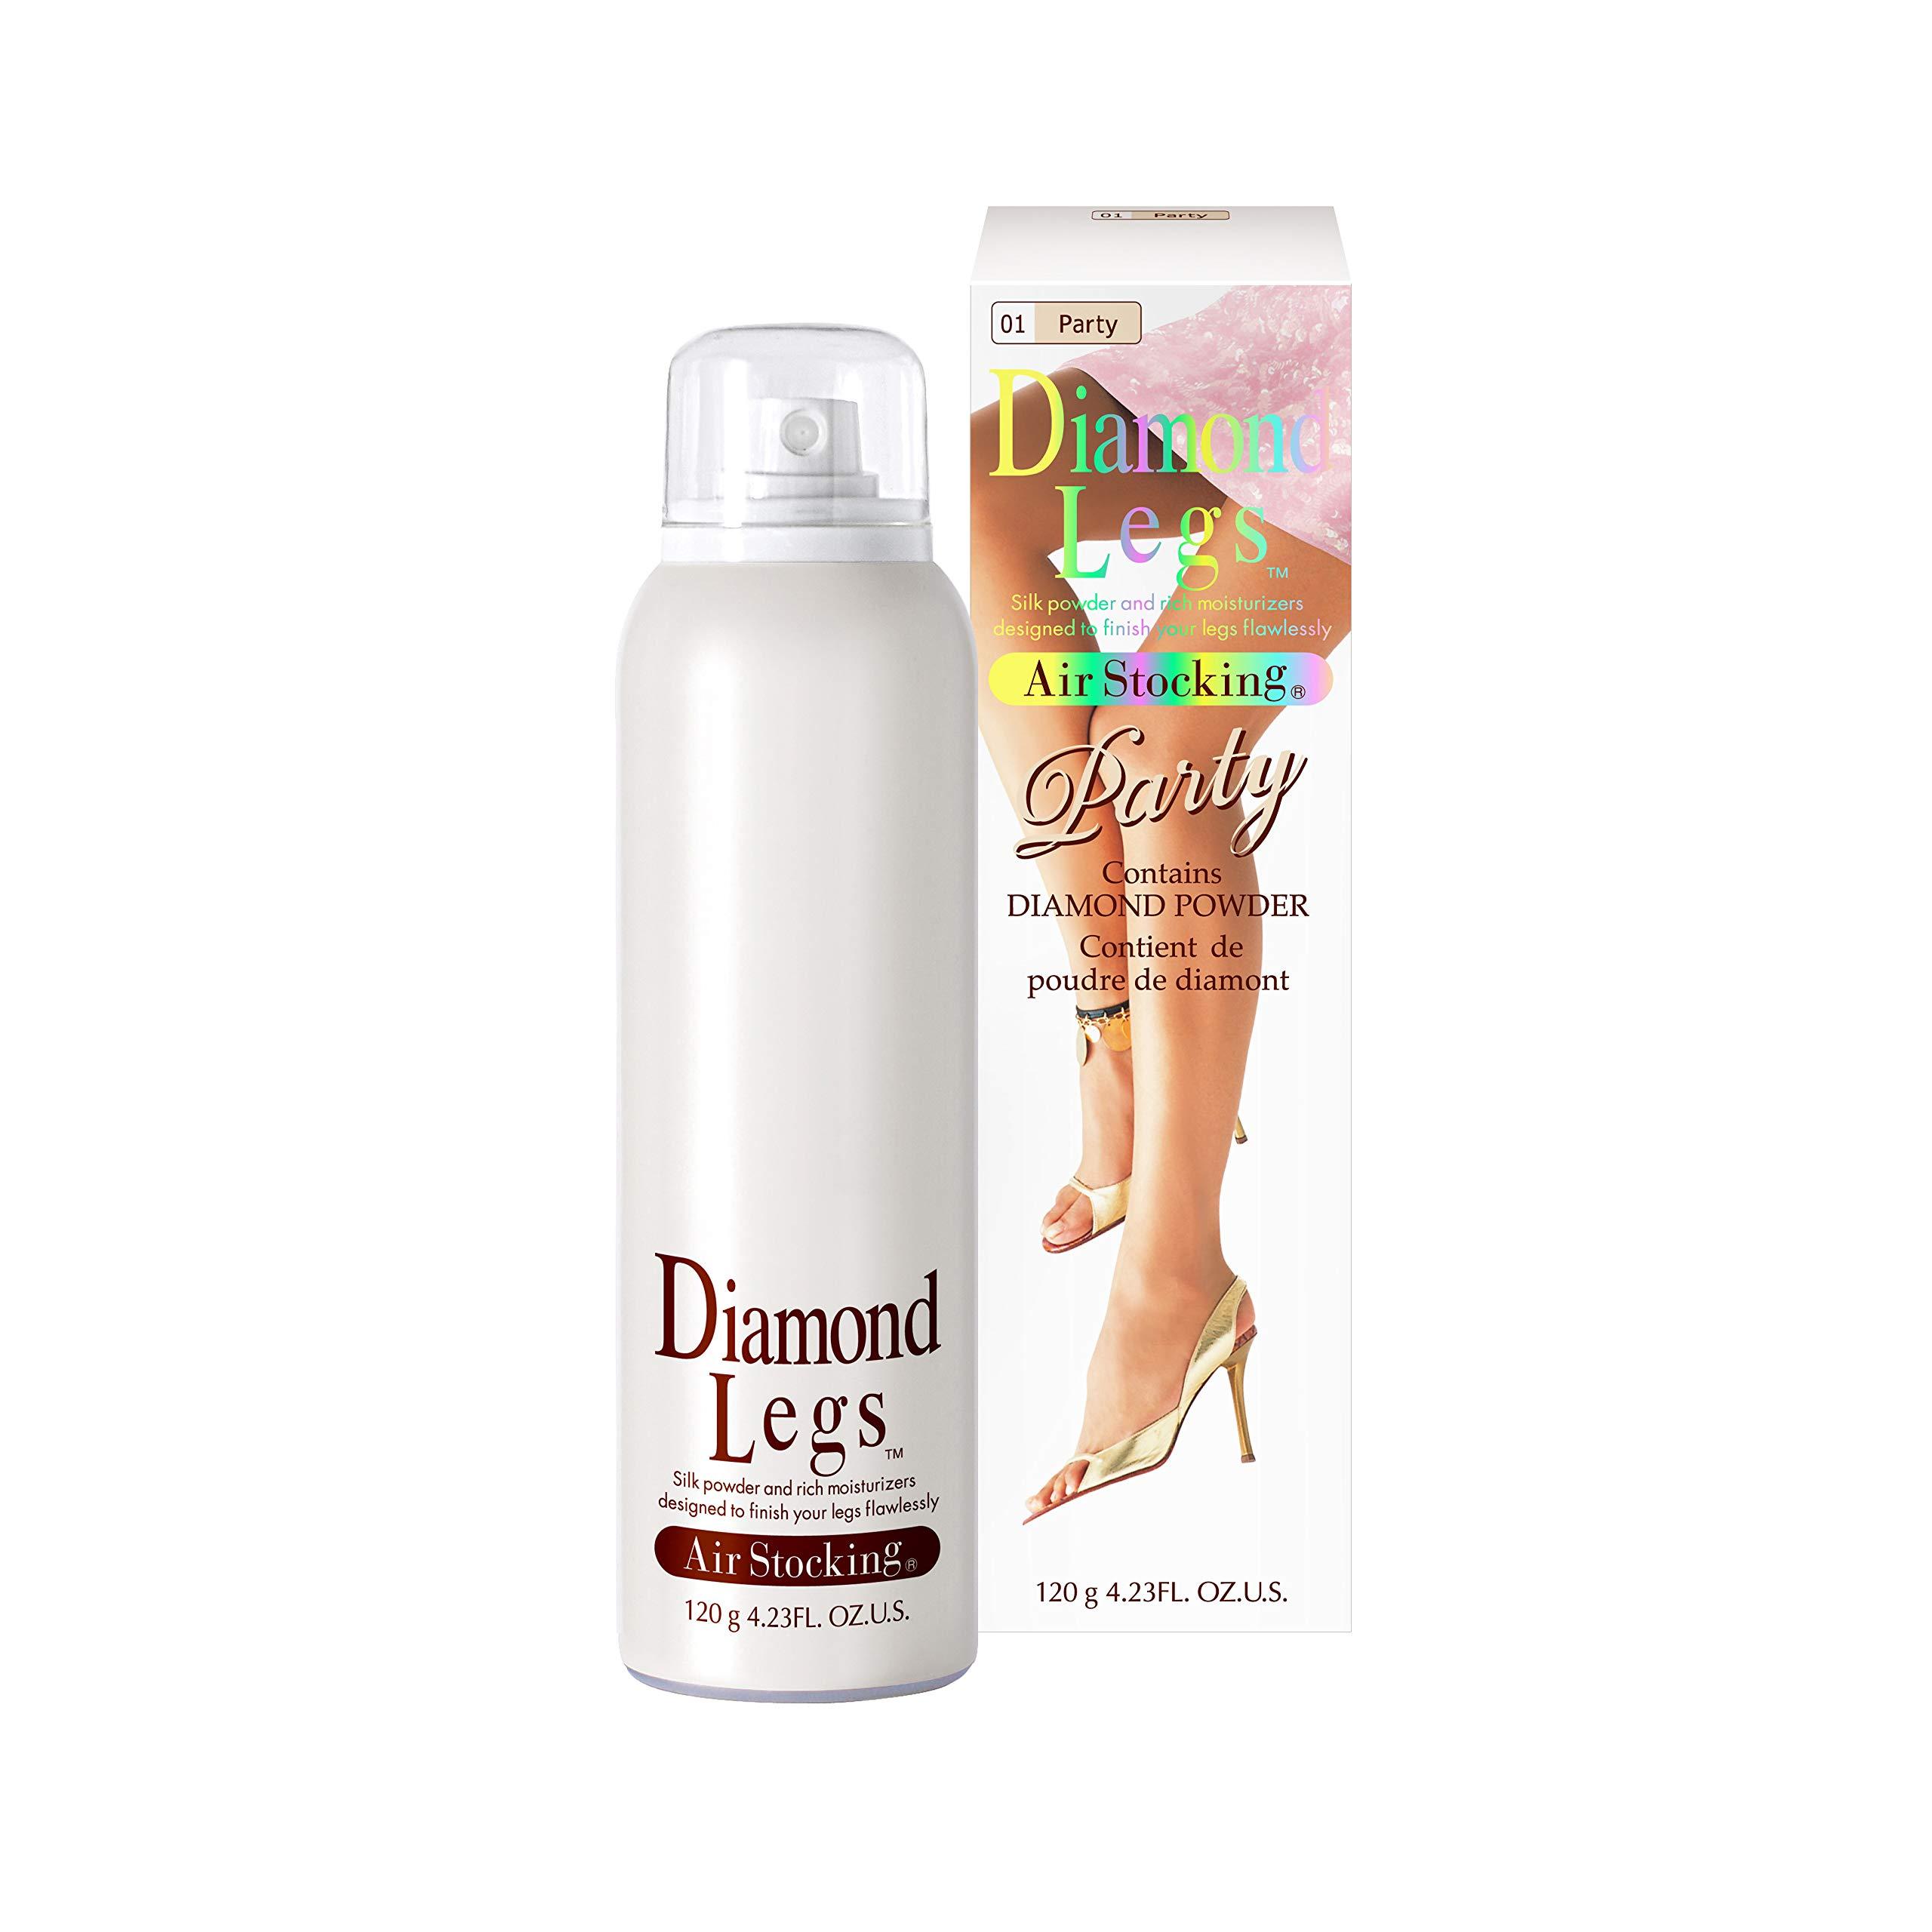 Air Stocking Diamond Legs [DL01] Light Natural 120g